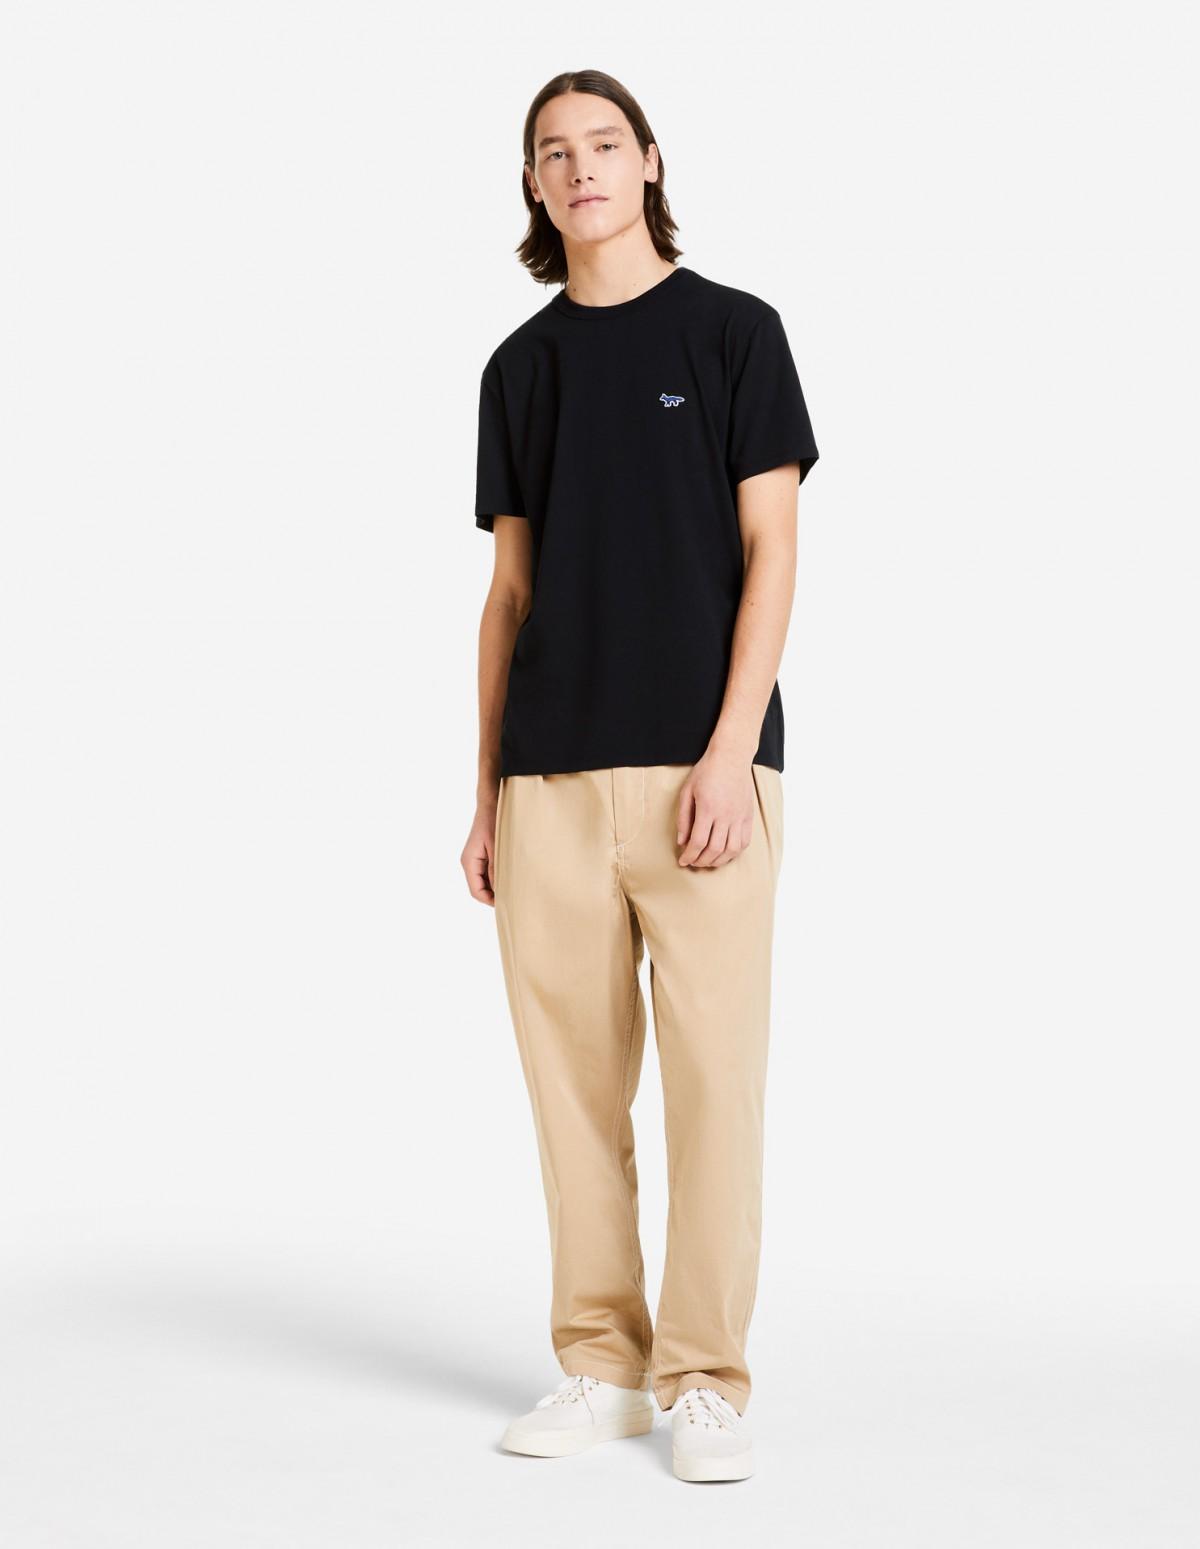 Basic Black Short Sleeve Cotton T-shirt